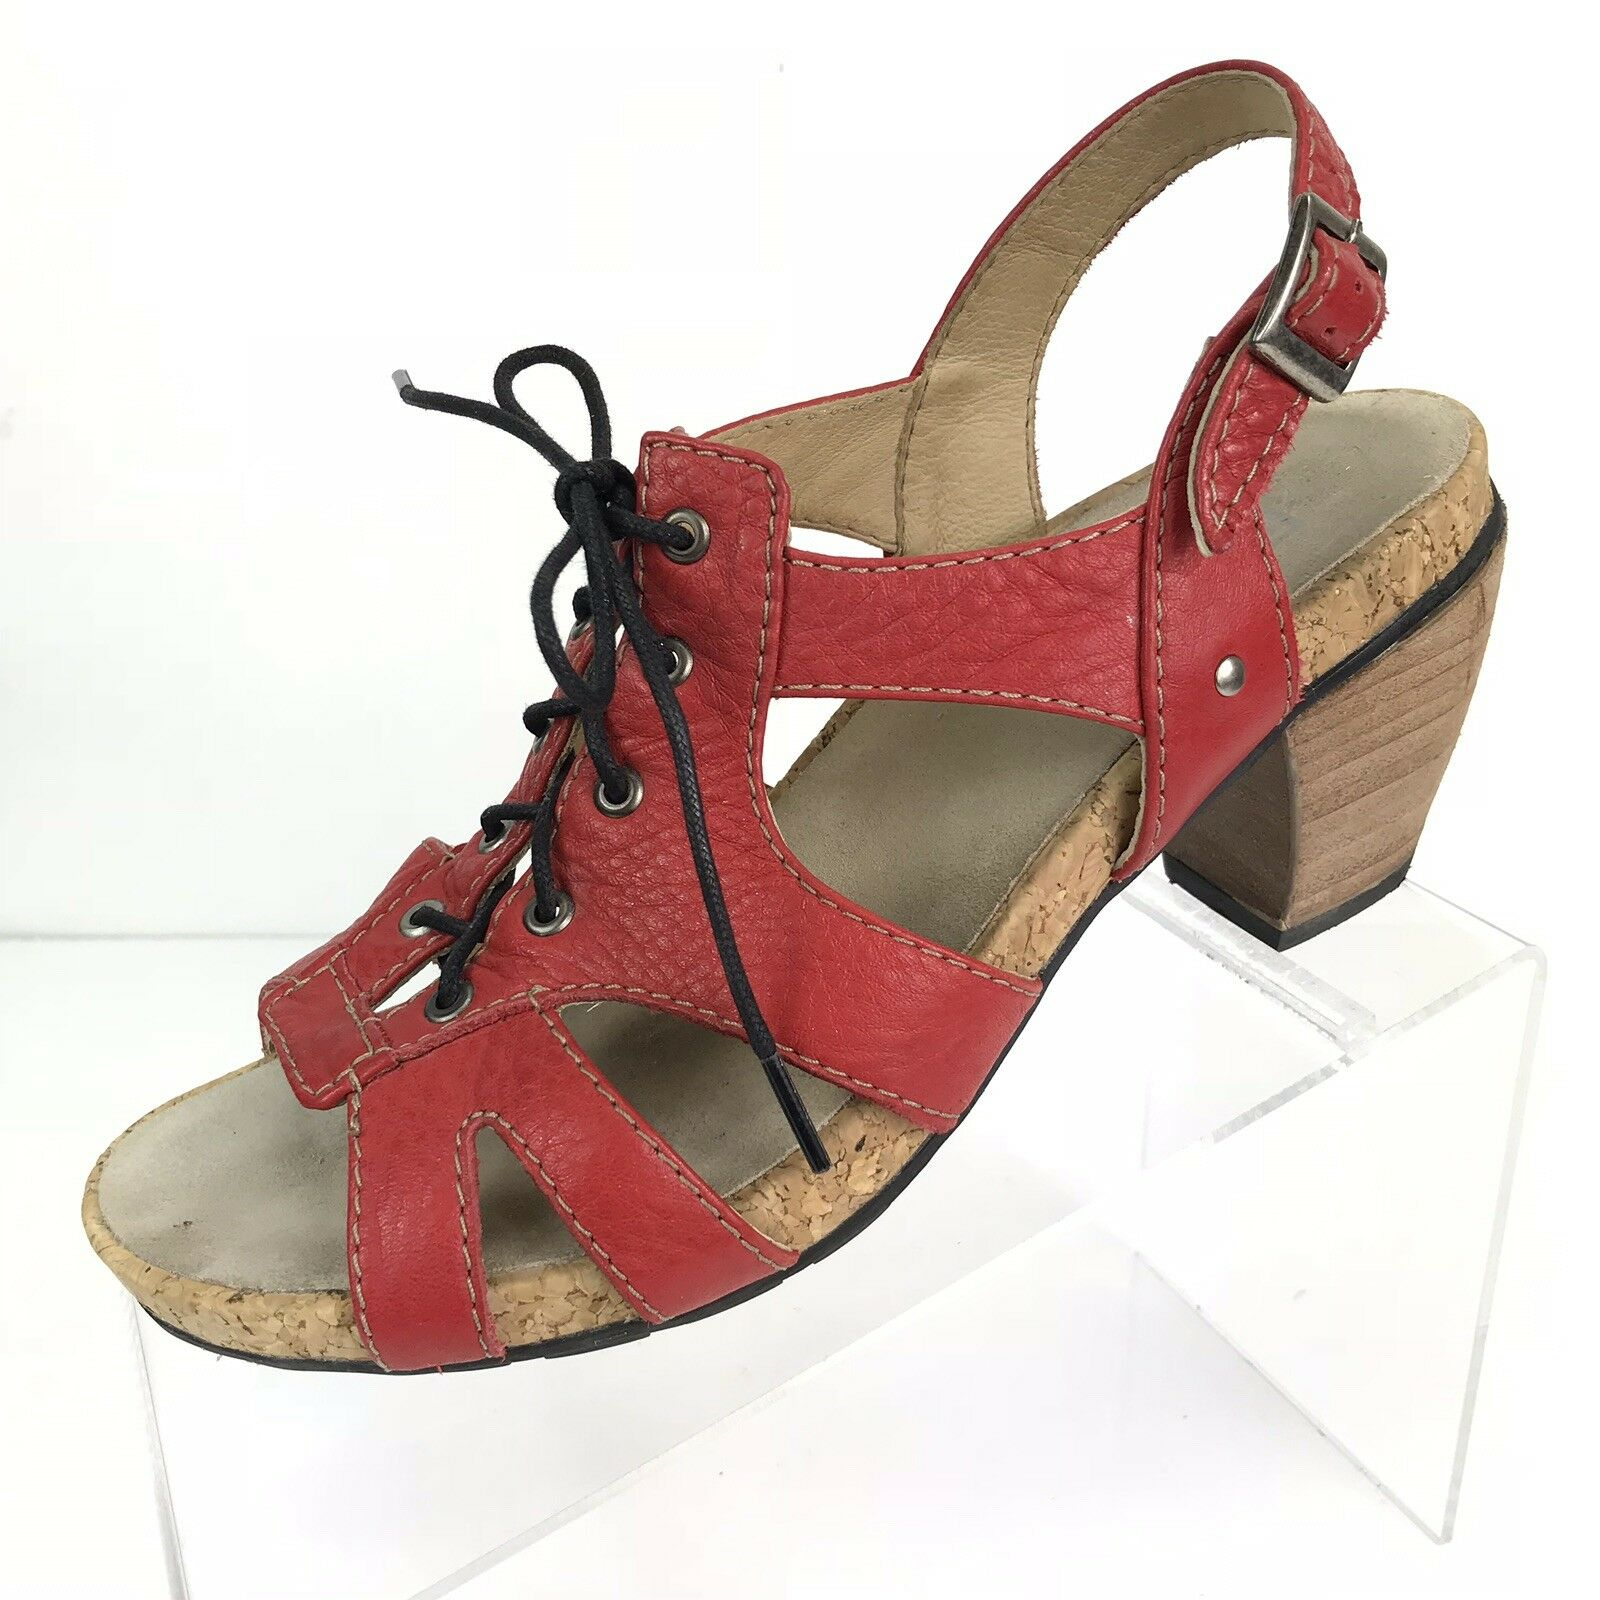 Wolky Fancy Me Lion damen rot Leather Sandals Heels schuhe schuhe schuhe US 9.5M EUR 41 LaceUp e930e1